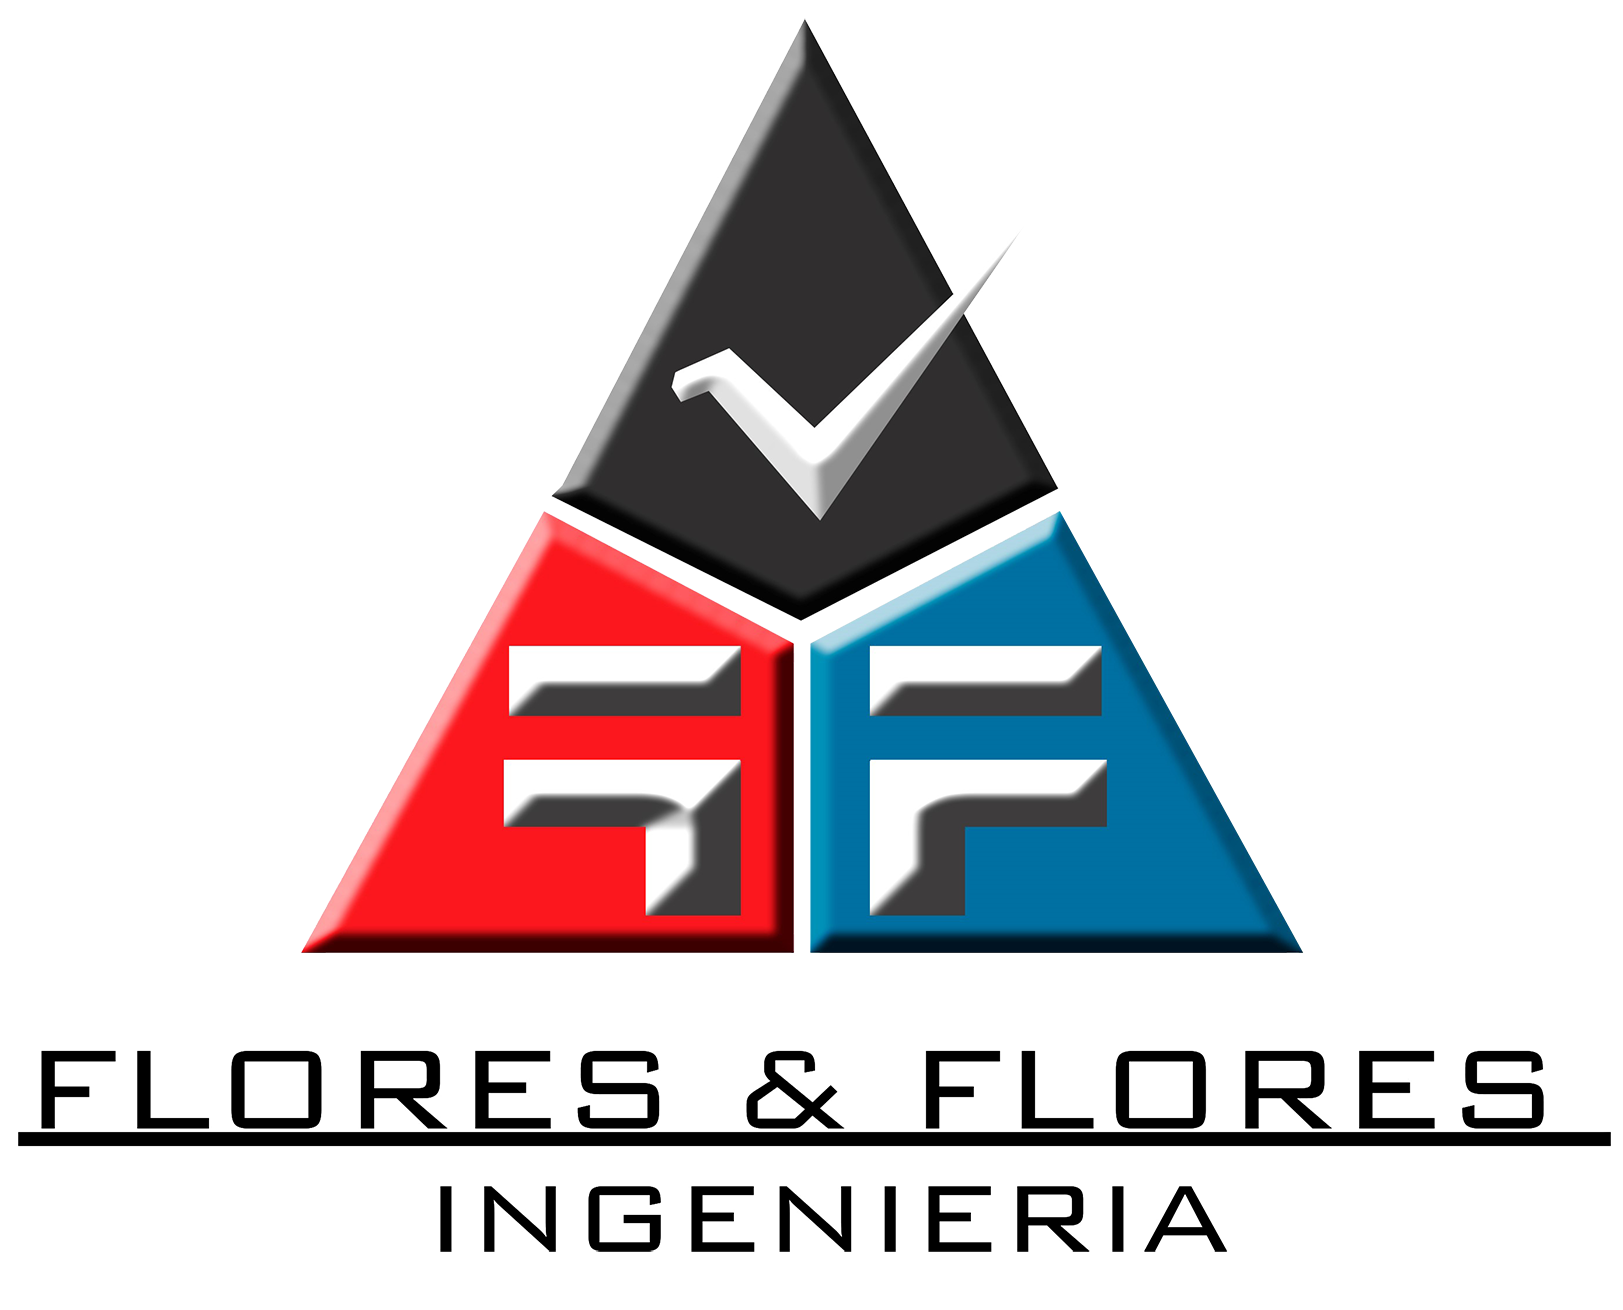 http://www.fyfingenieria.com